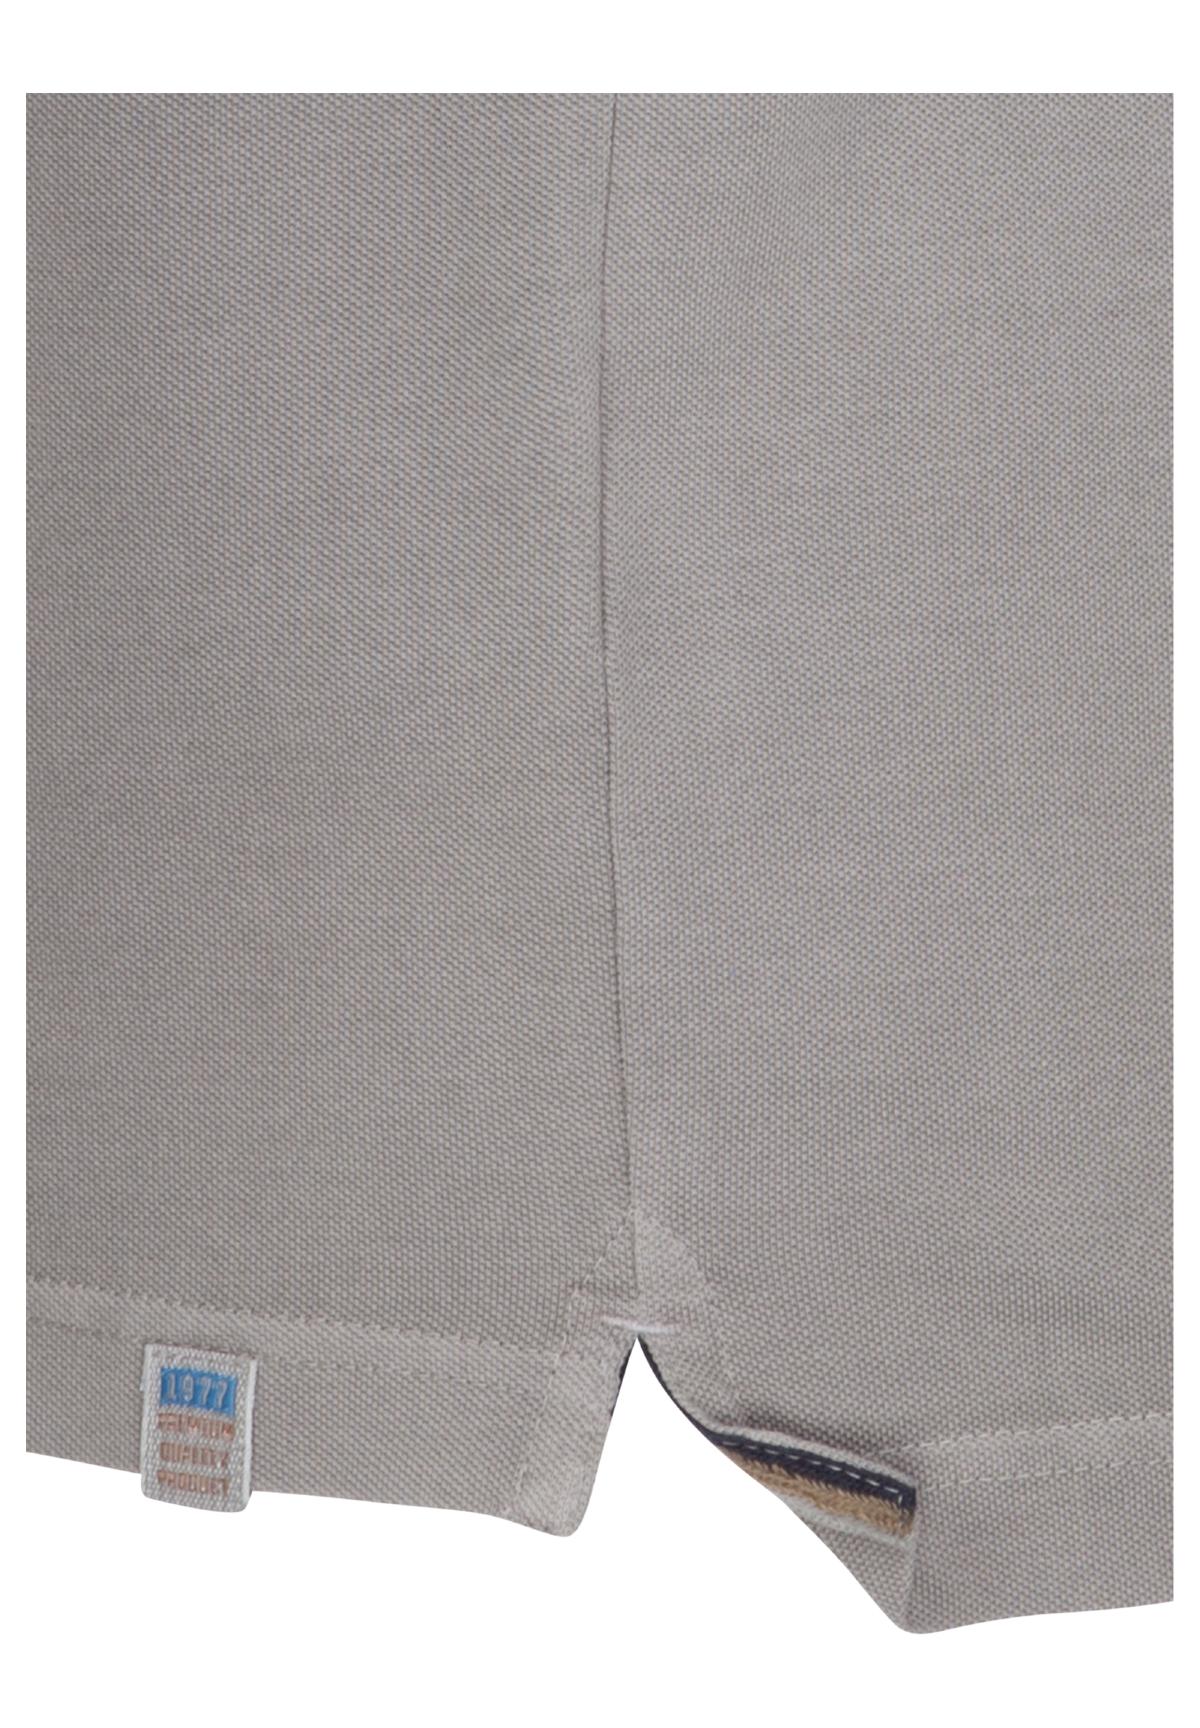 Camel-Active-Herren-Shirt-Poloshirt-Pique-Regular-Fit-NEU Indexbild 39